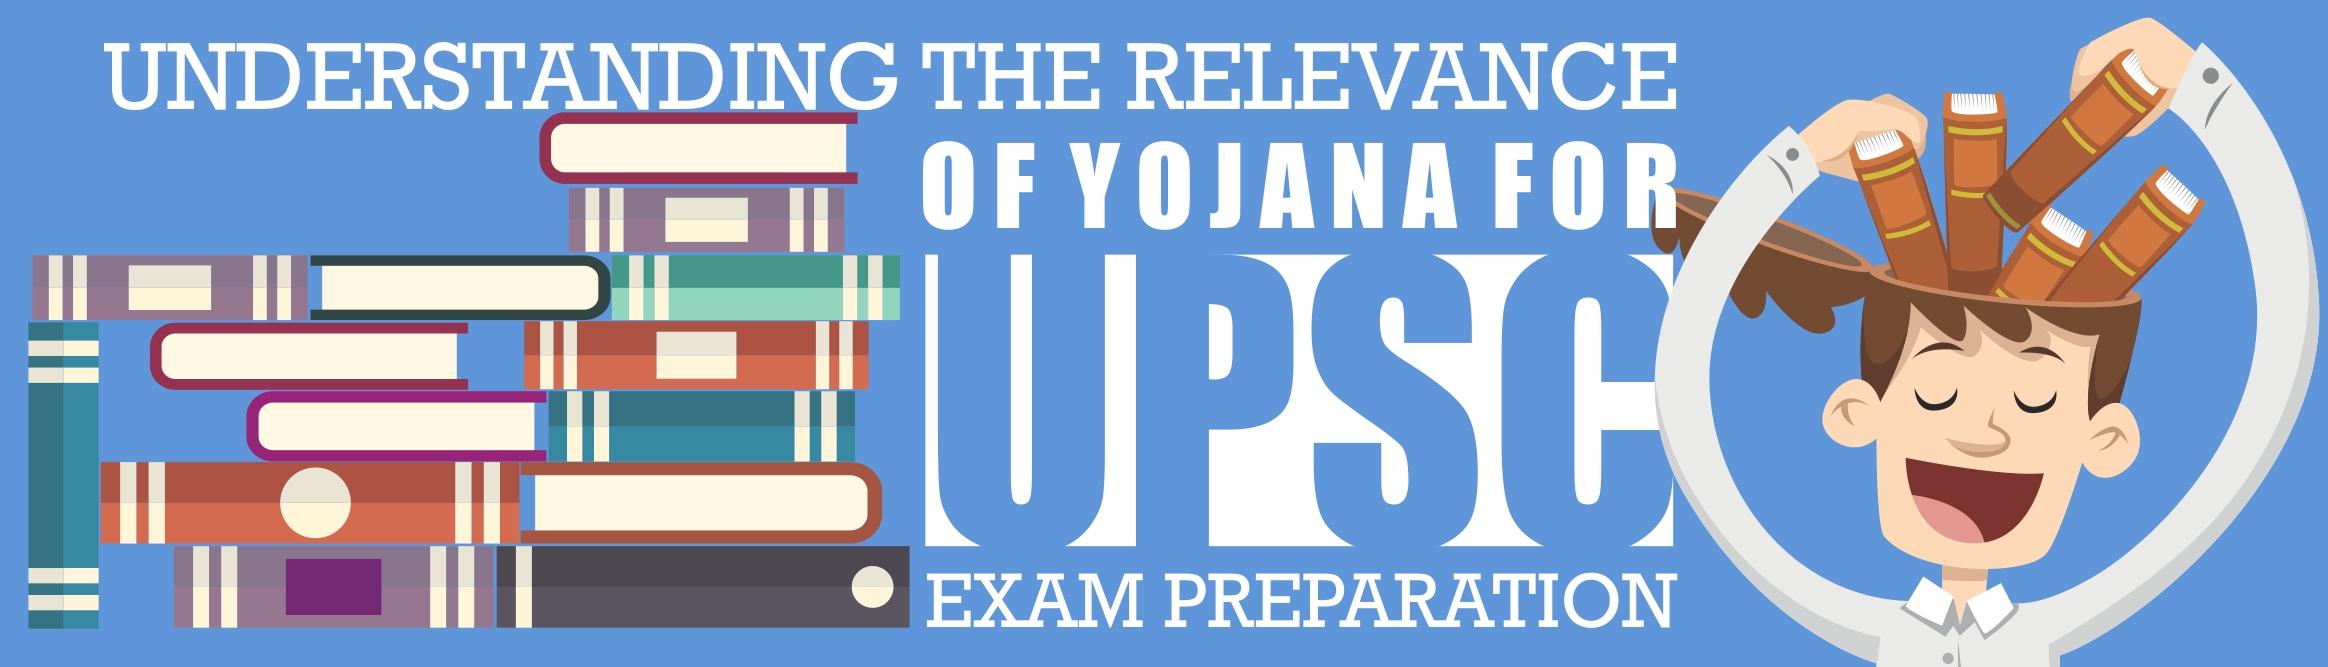 understanding the relevance of yojana for upsc